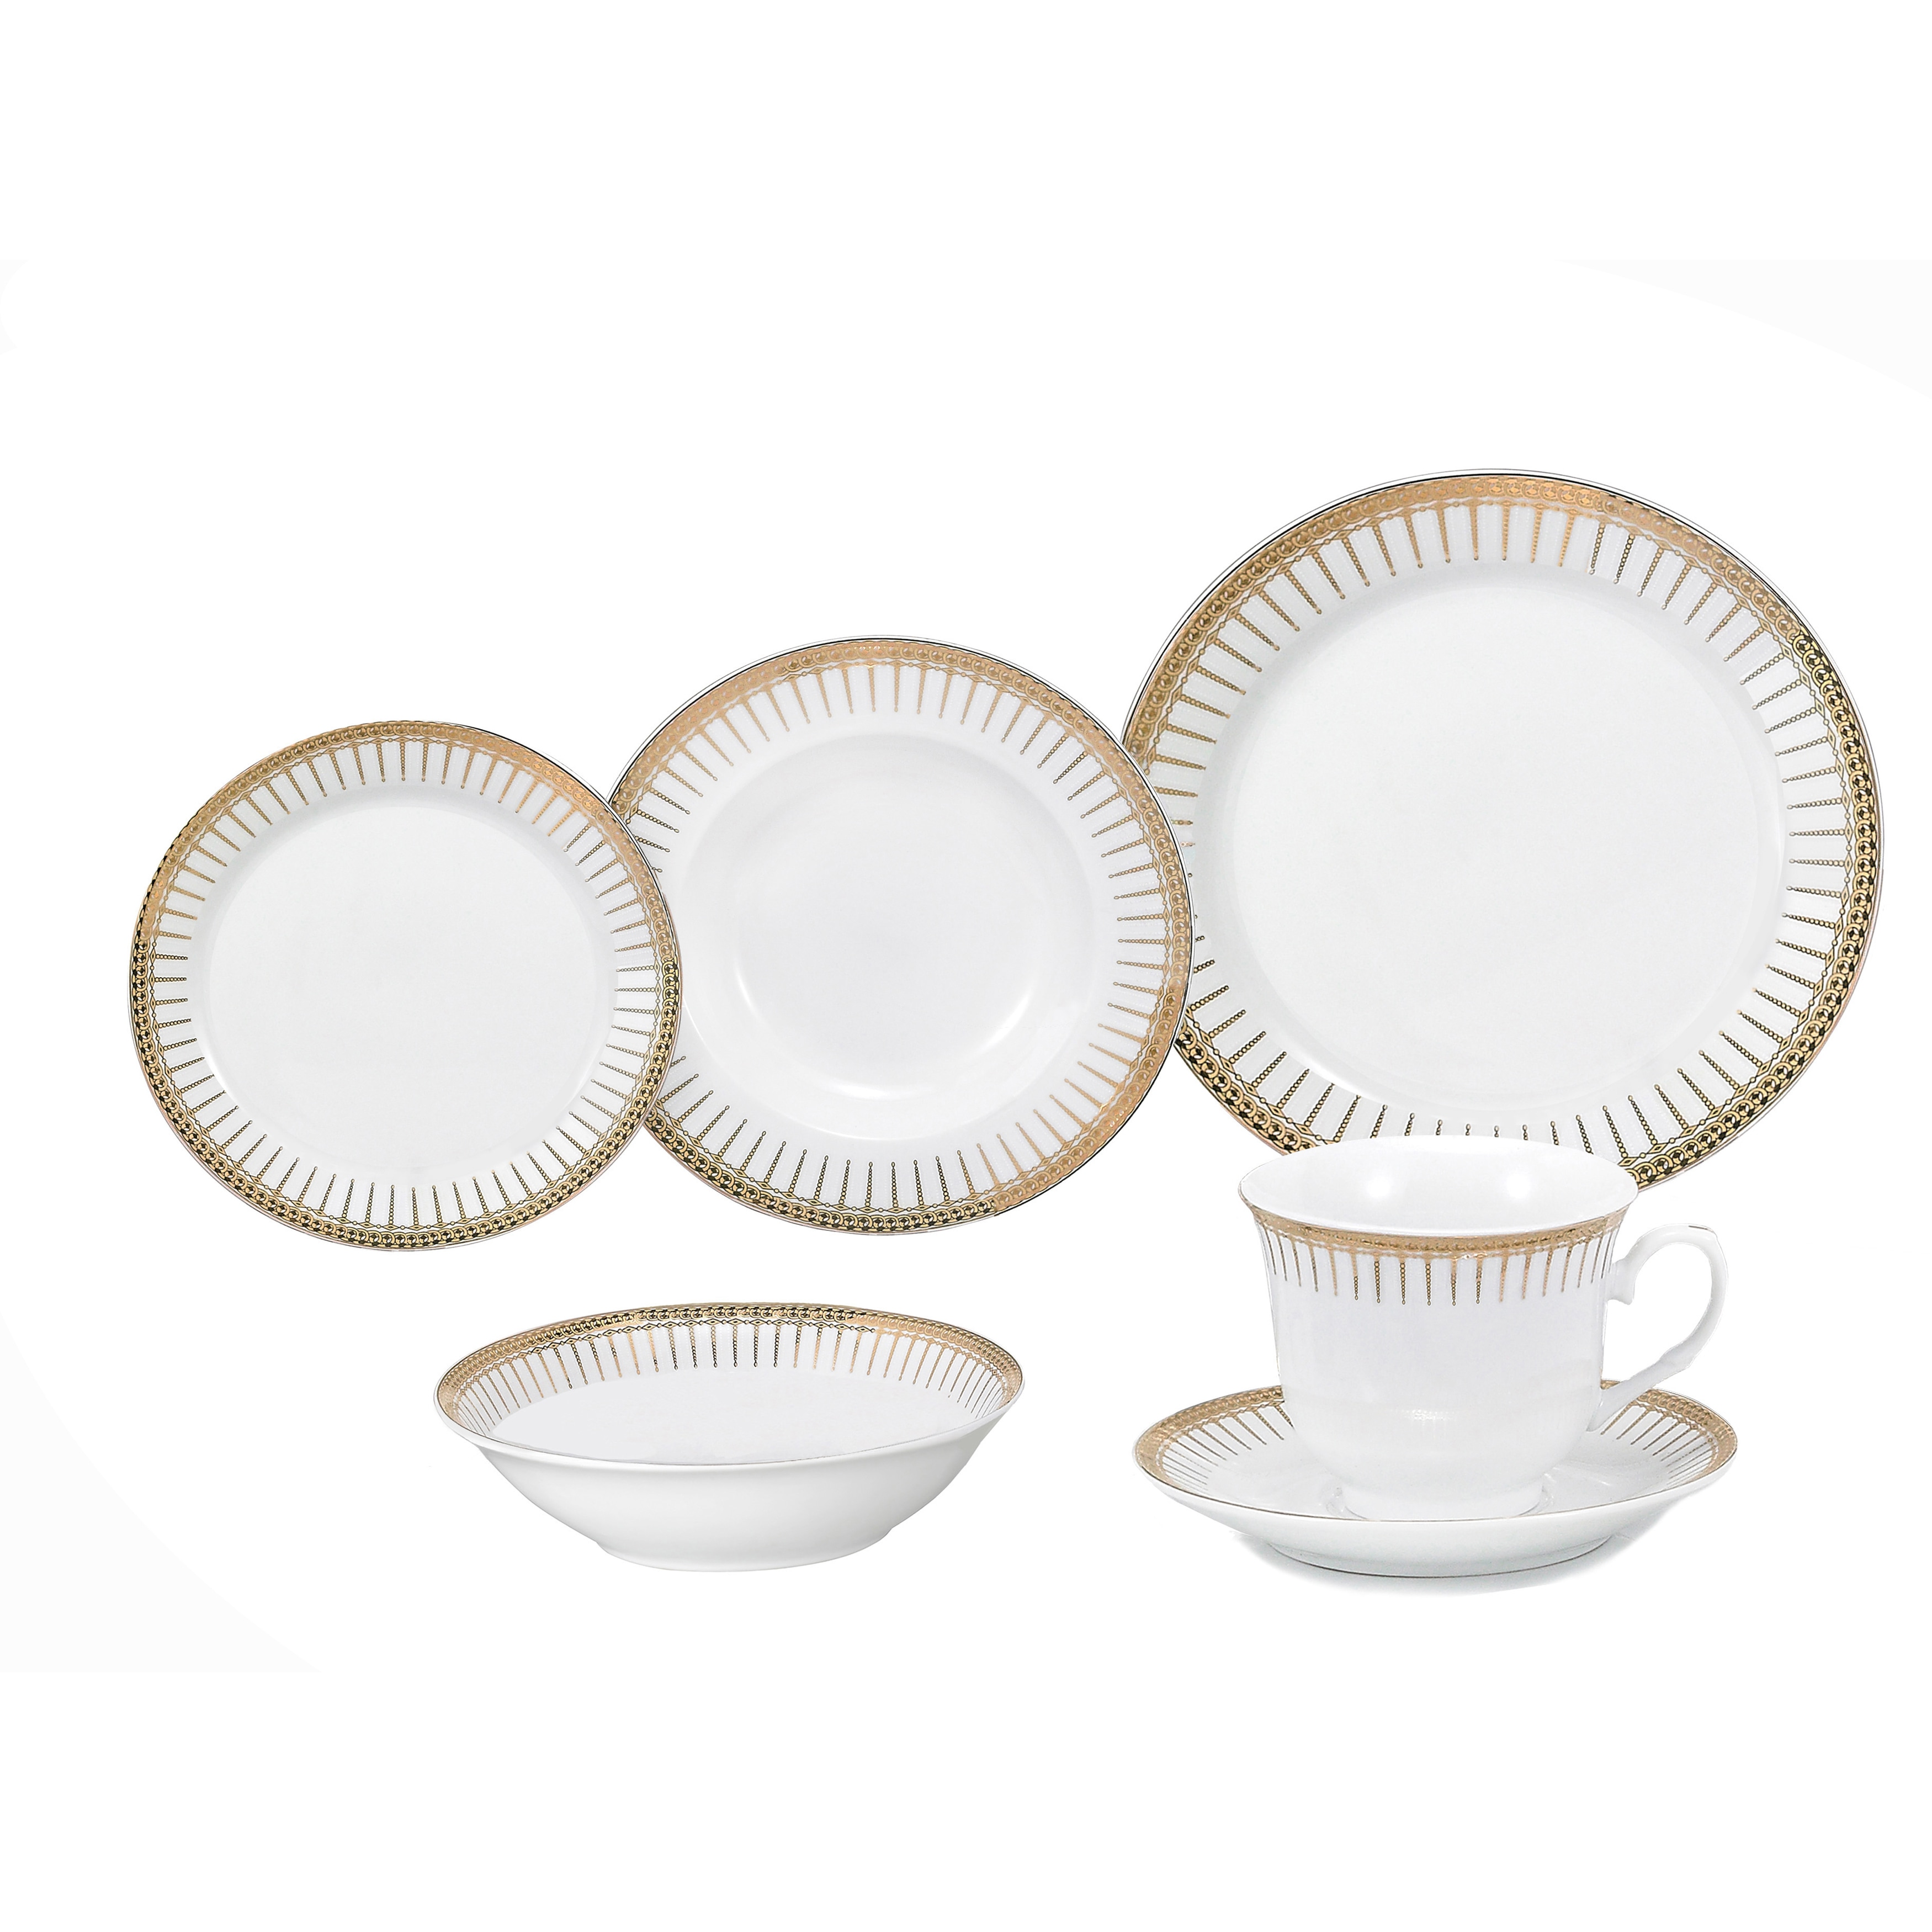 Lorren Home Trends Aria Porcelain Dinnerware 24-piece Set  sc 1 st  eBay & Details about Lorren Home Trends Aria Porcelain Dinnerware 24-piece Set